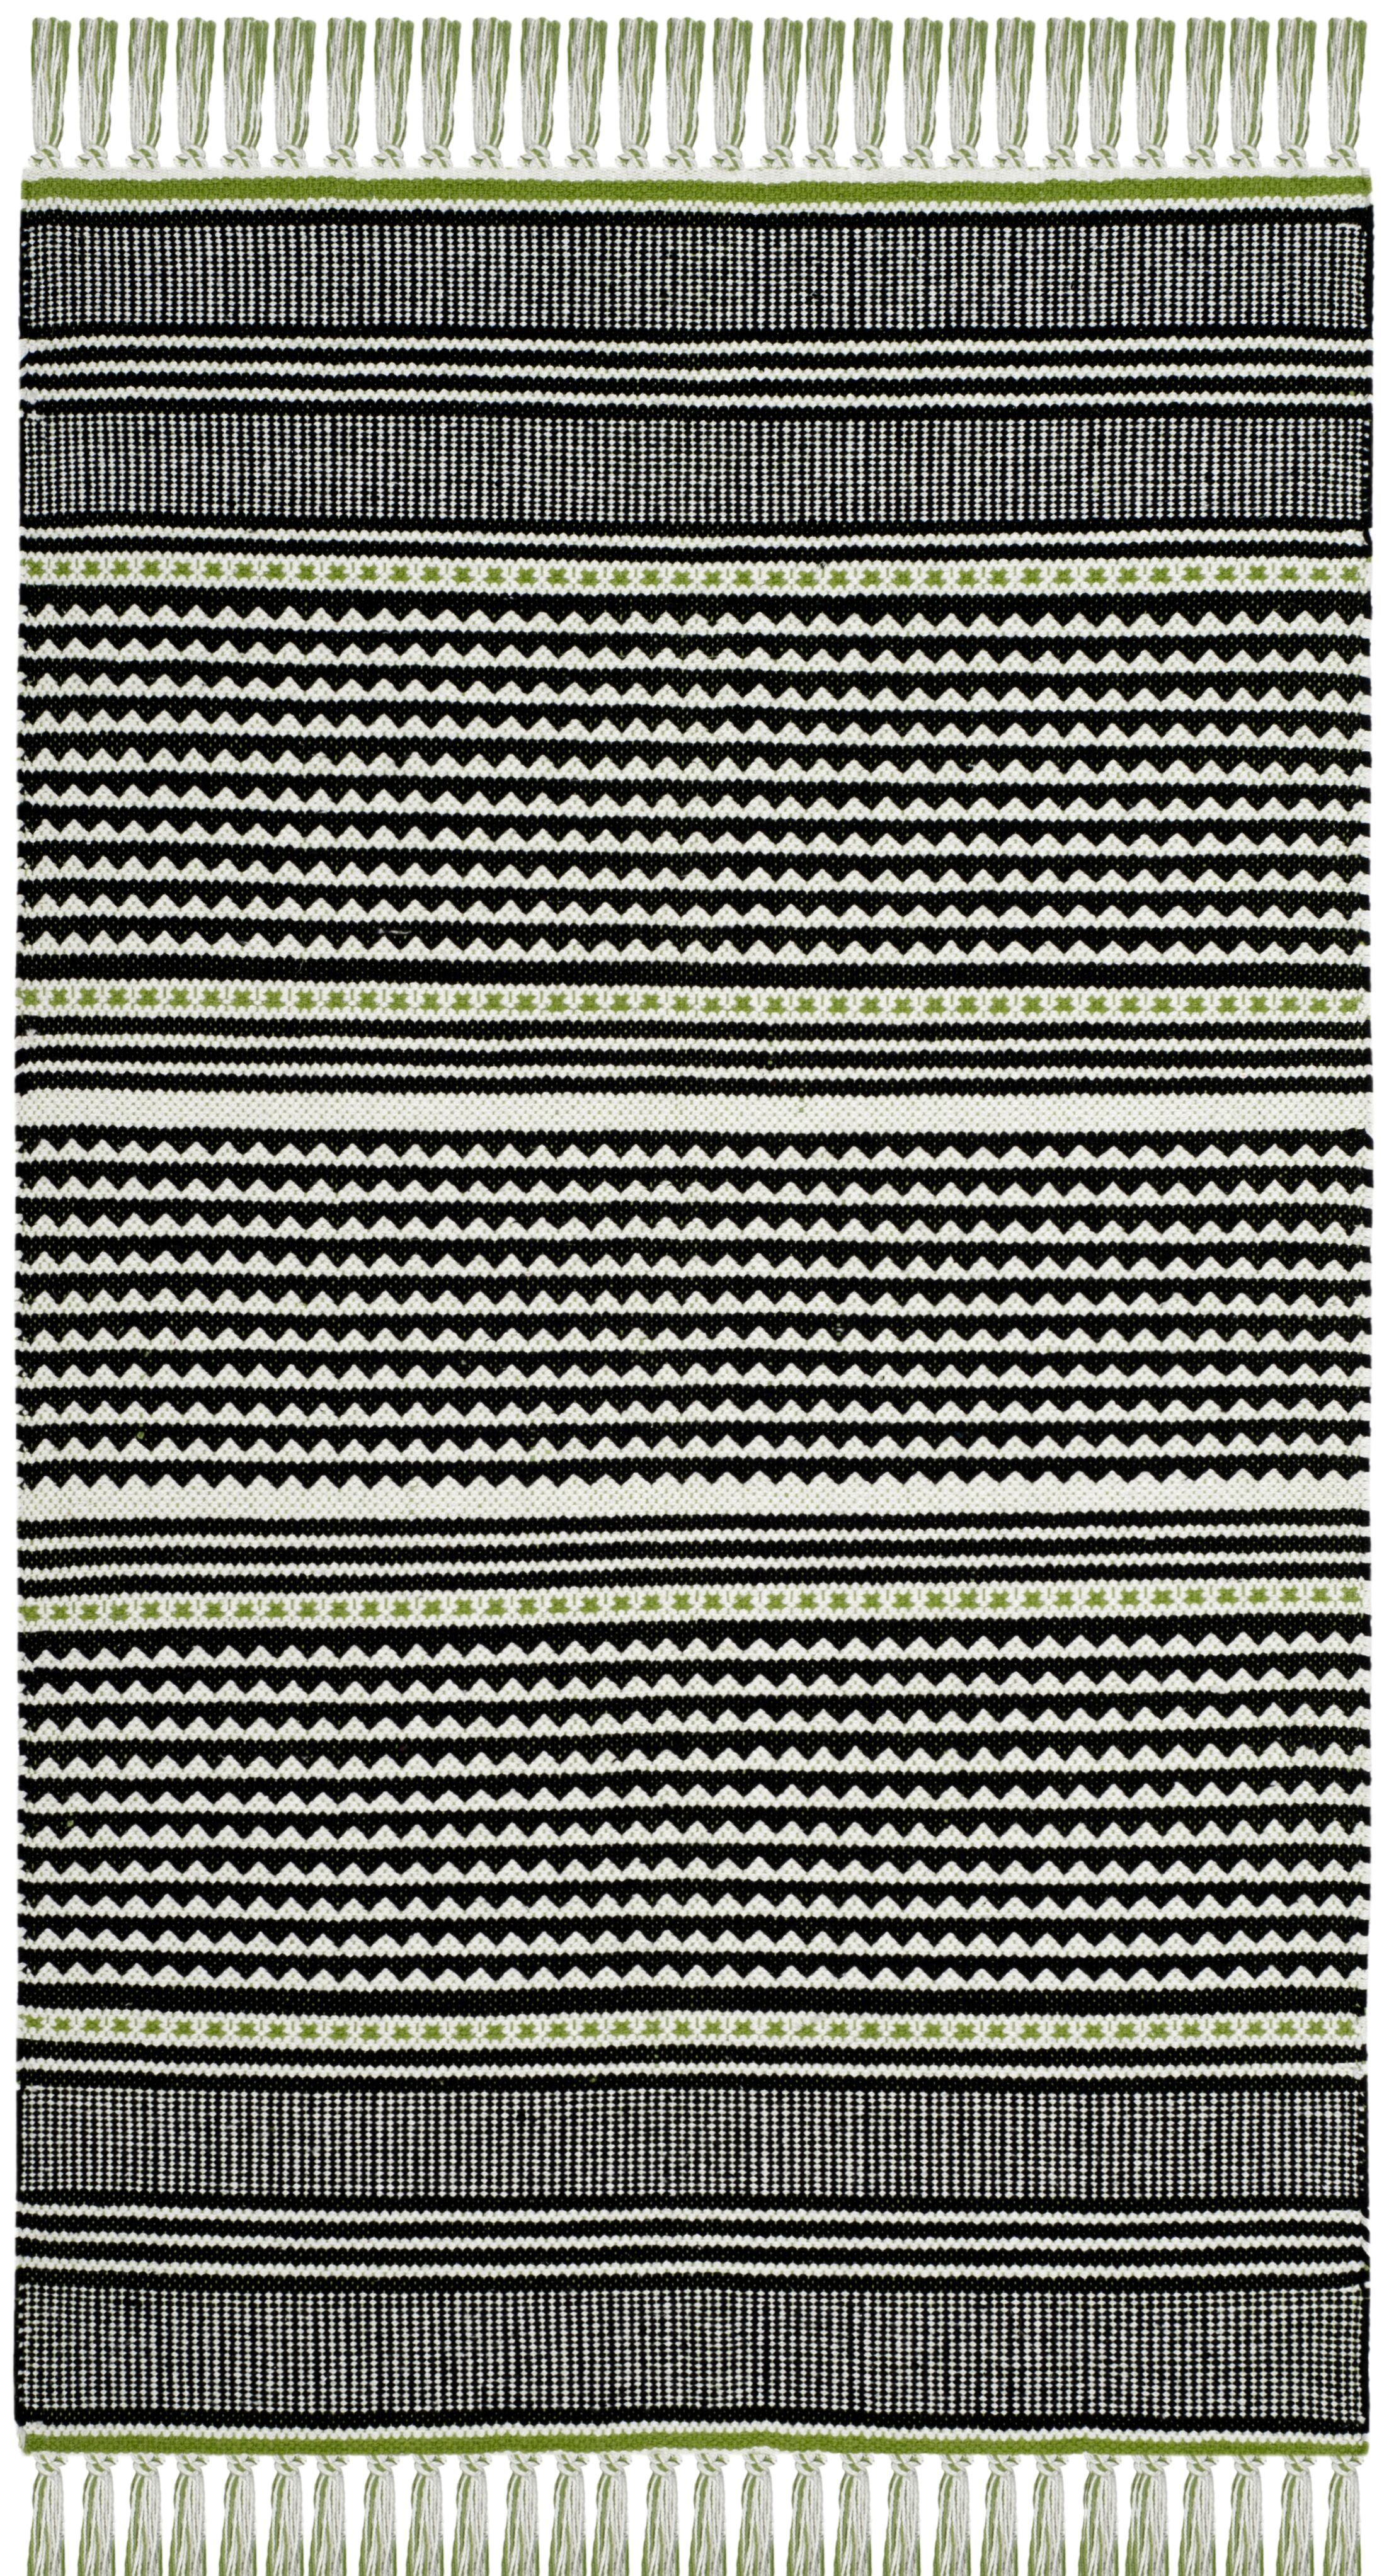 Granada Hand-Woven Green/Gray Area Rug Rug Size: Rectangle 5' x 8'